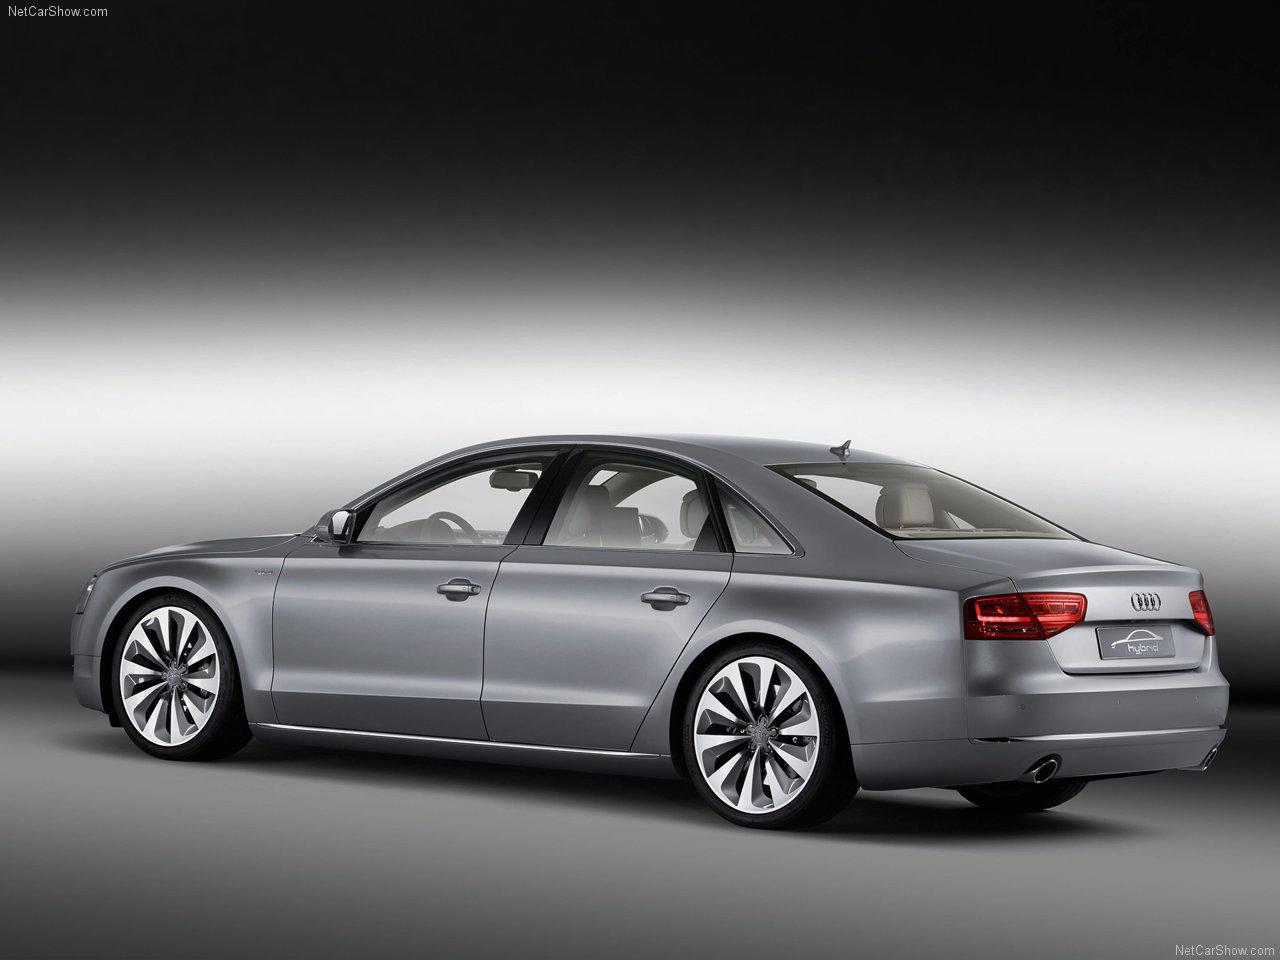 Audi-A8_Hybrid_Concept_2010_1280x960_wallpaper_06